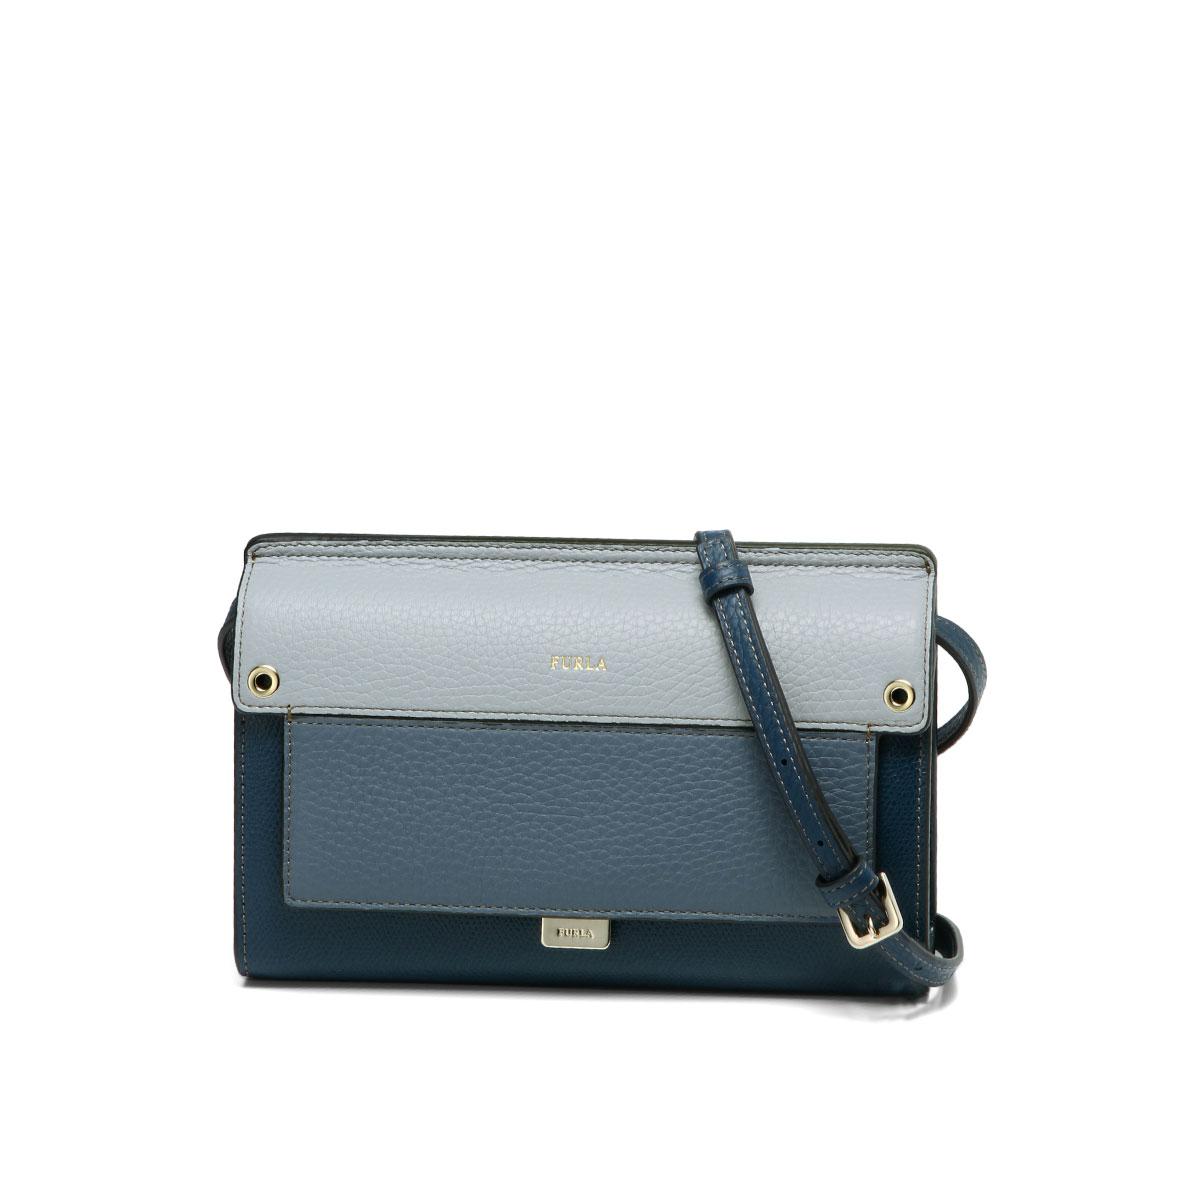 8f37a69abd23 1007278 フルラ FURLA bag lady BLM7 AHC G65 shoulder bag mini-LIKE MINI  CROSSBODY like ...